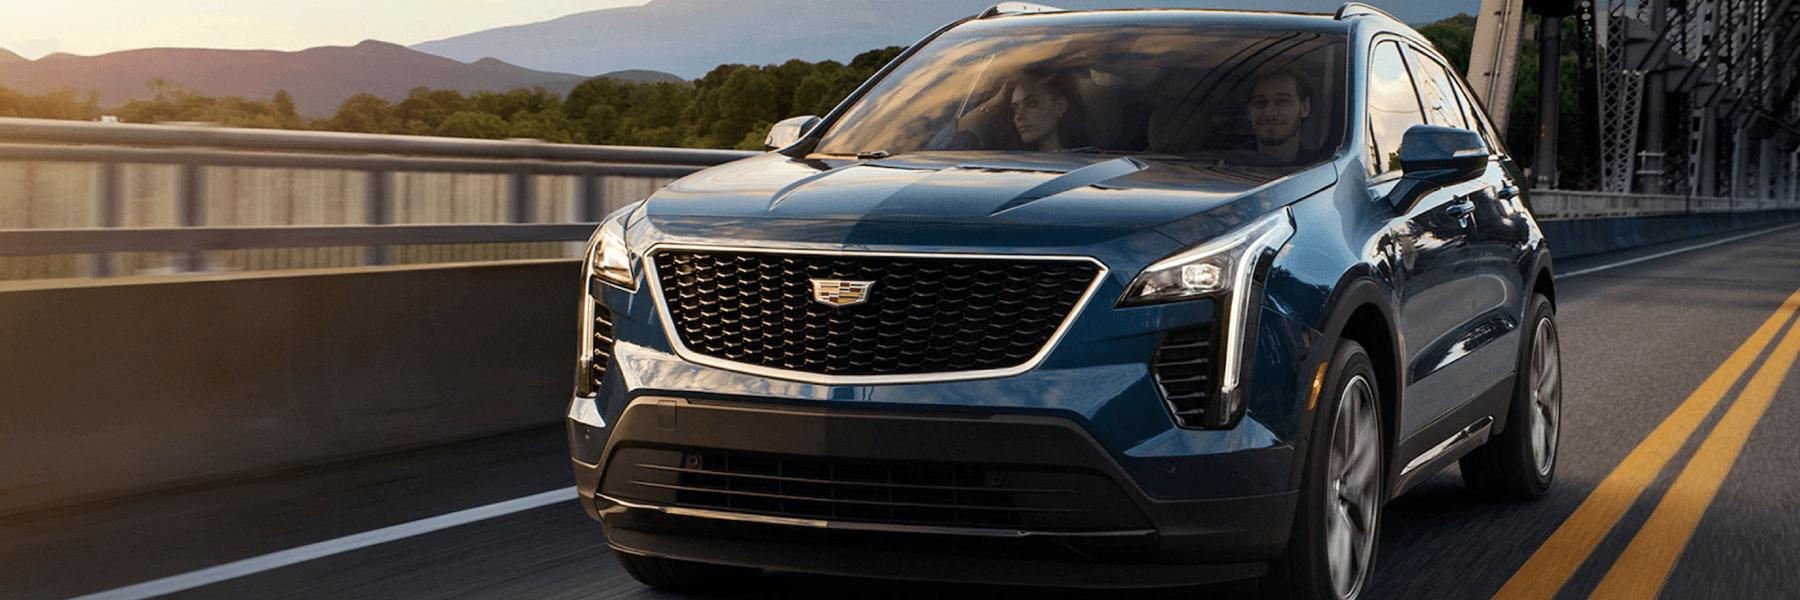 2020 Cadillac XT4 drives over bridge